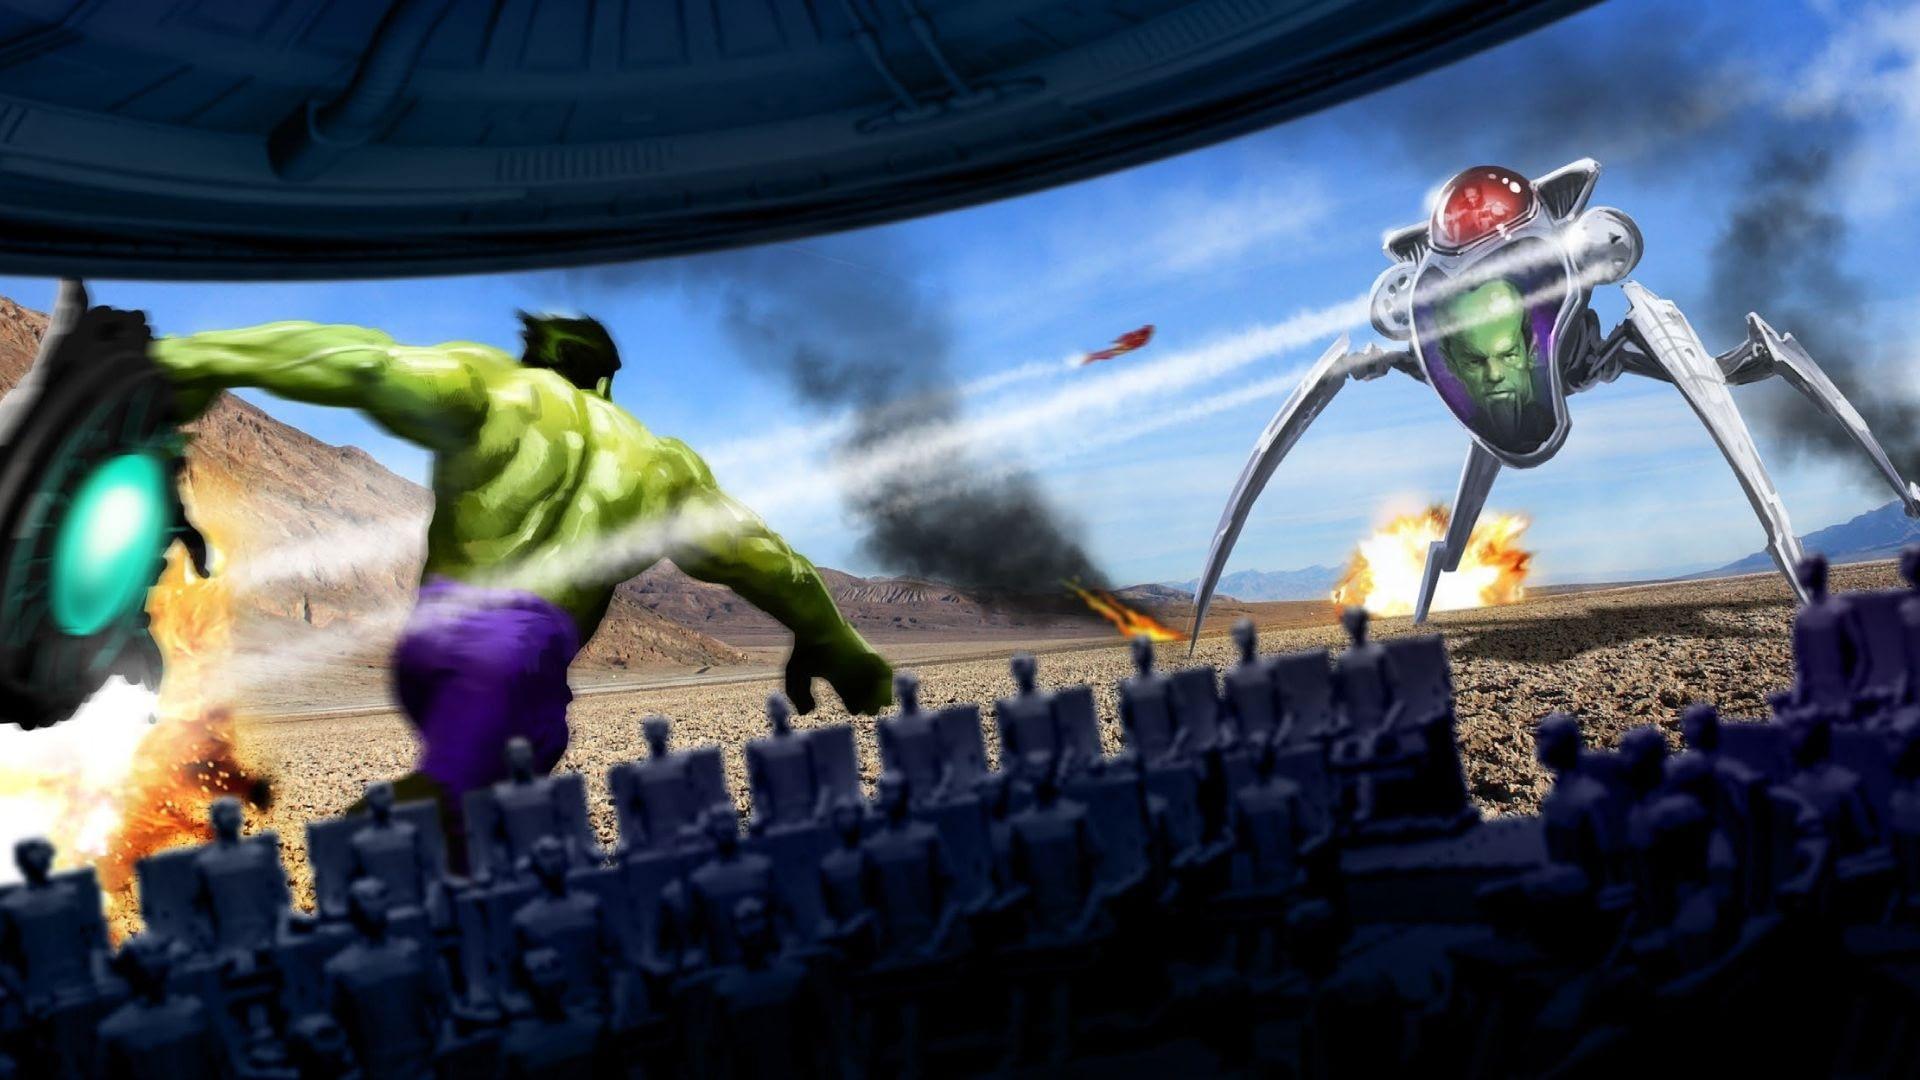 Hulk CirucMotion Theater